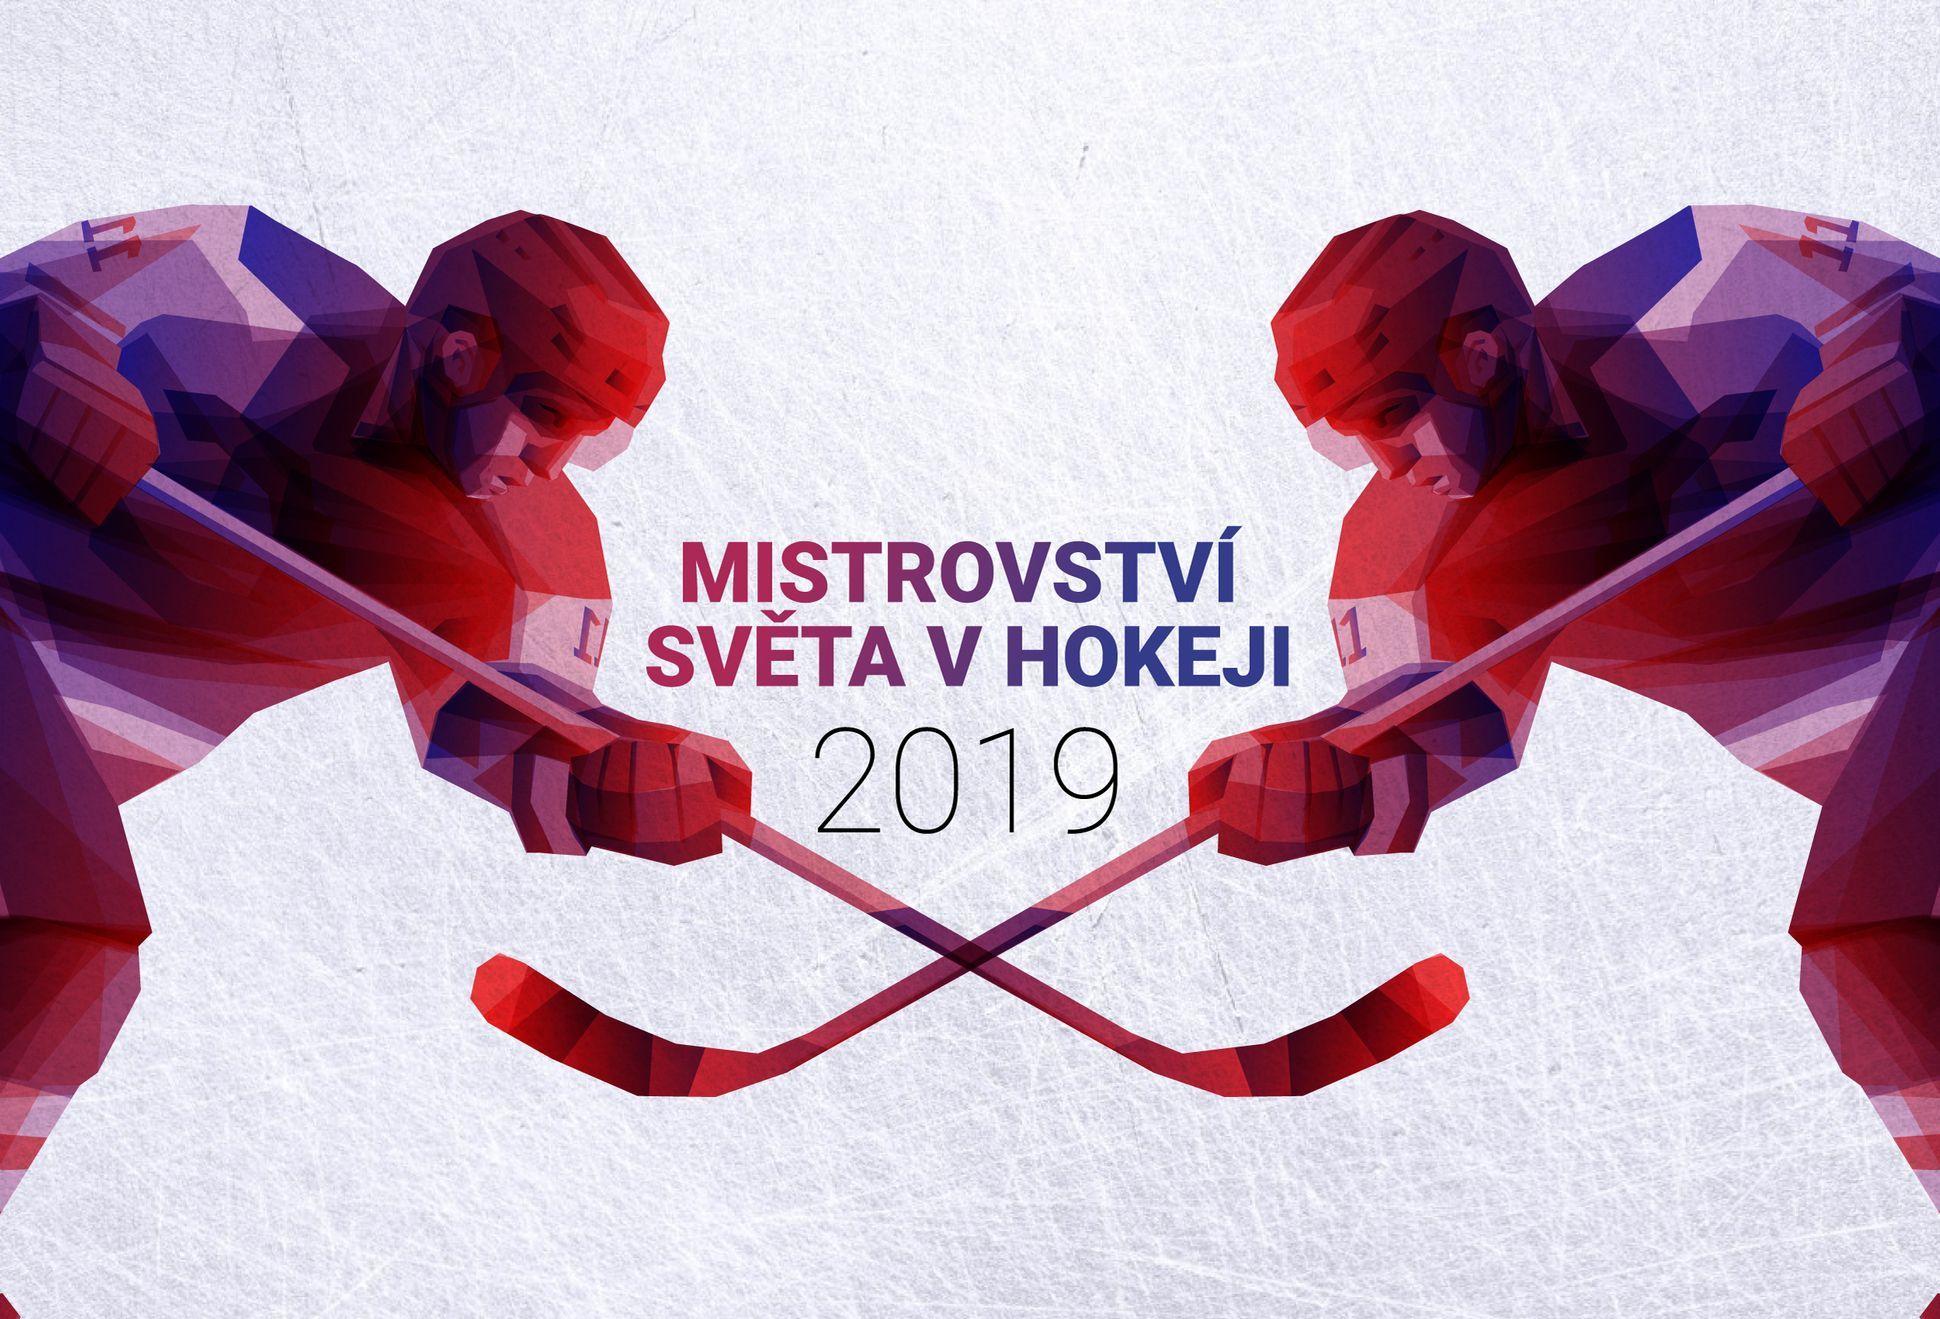 ed39ca161da6a Vše o MS v hokeji 2019 na Slovensku. Program, tabulky, výsledky,  statistiky. - Aktuálně.cz